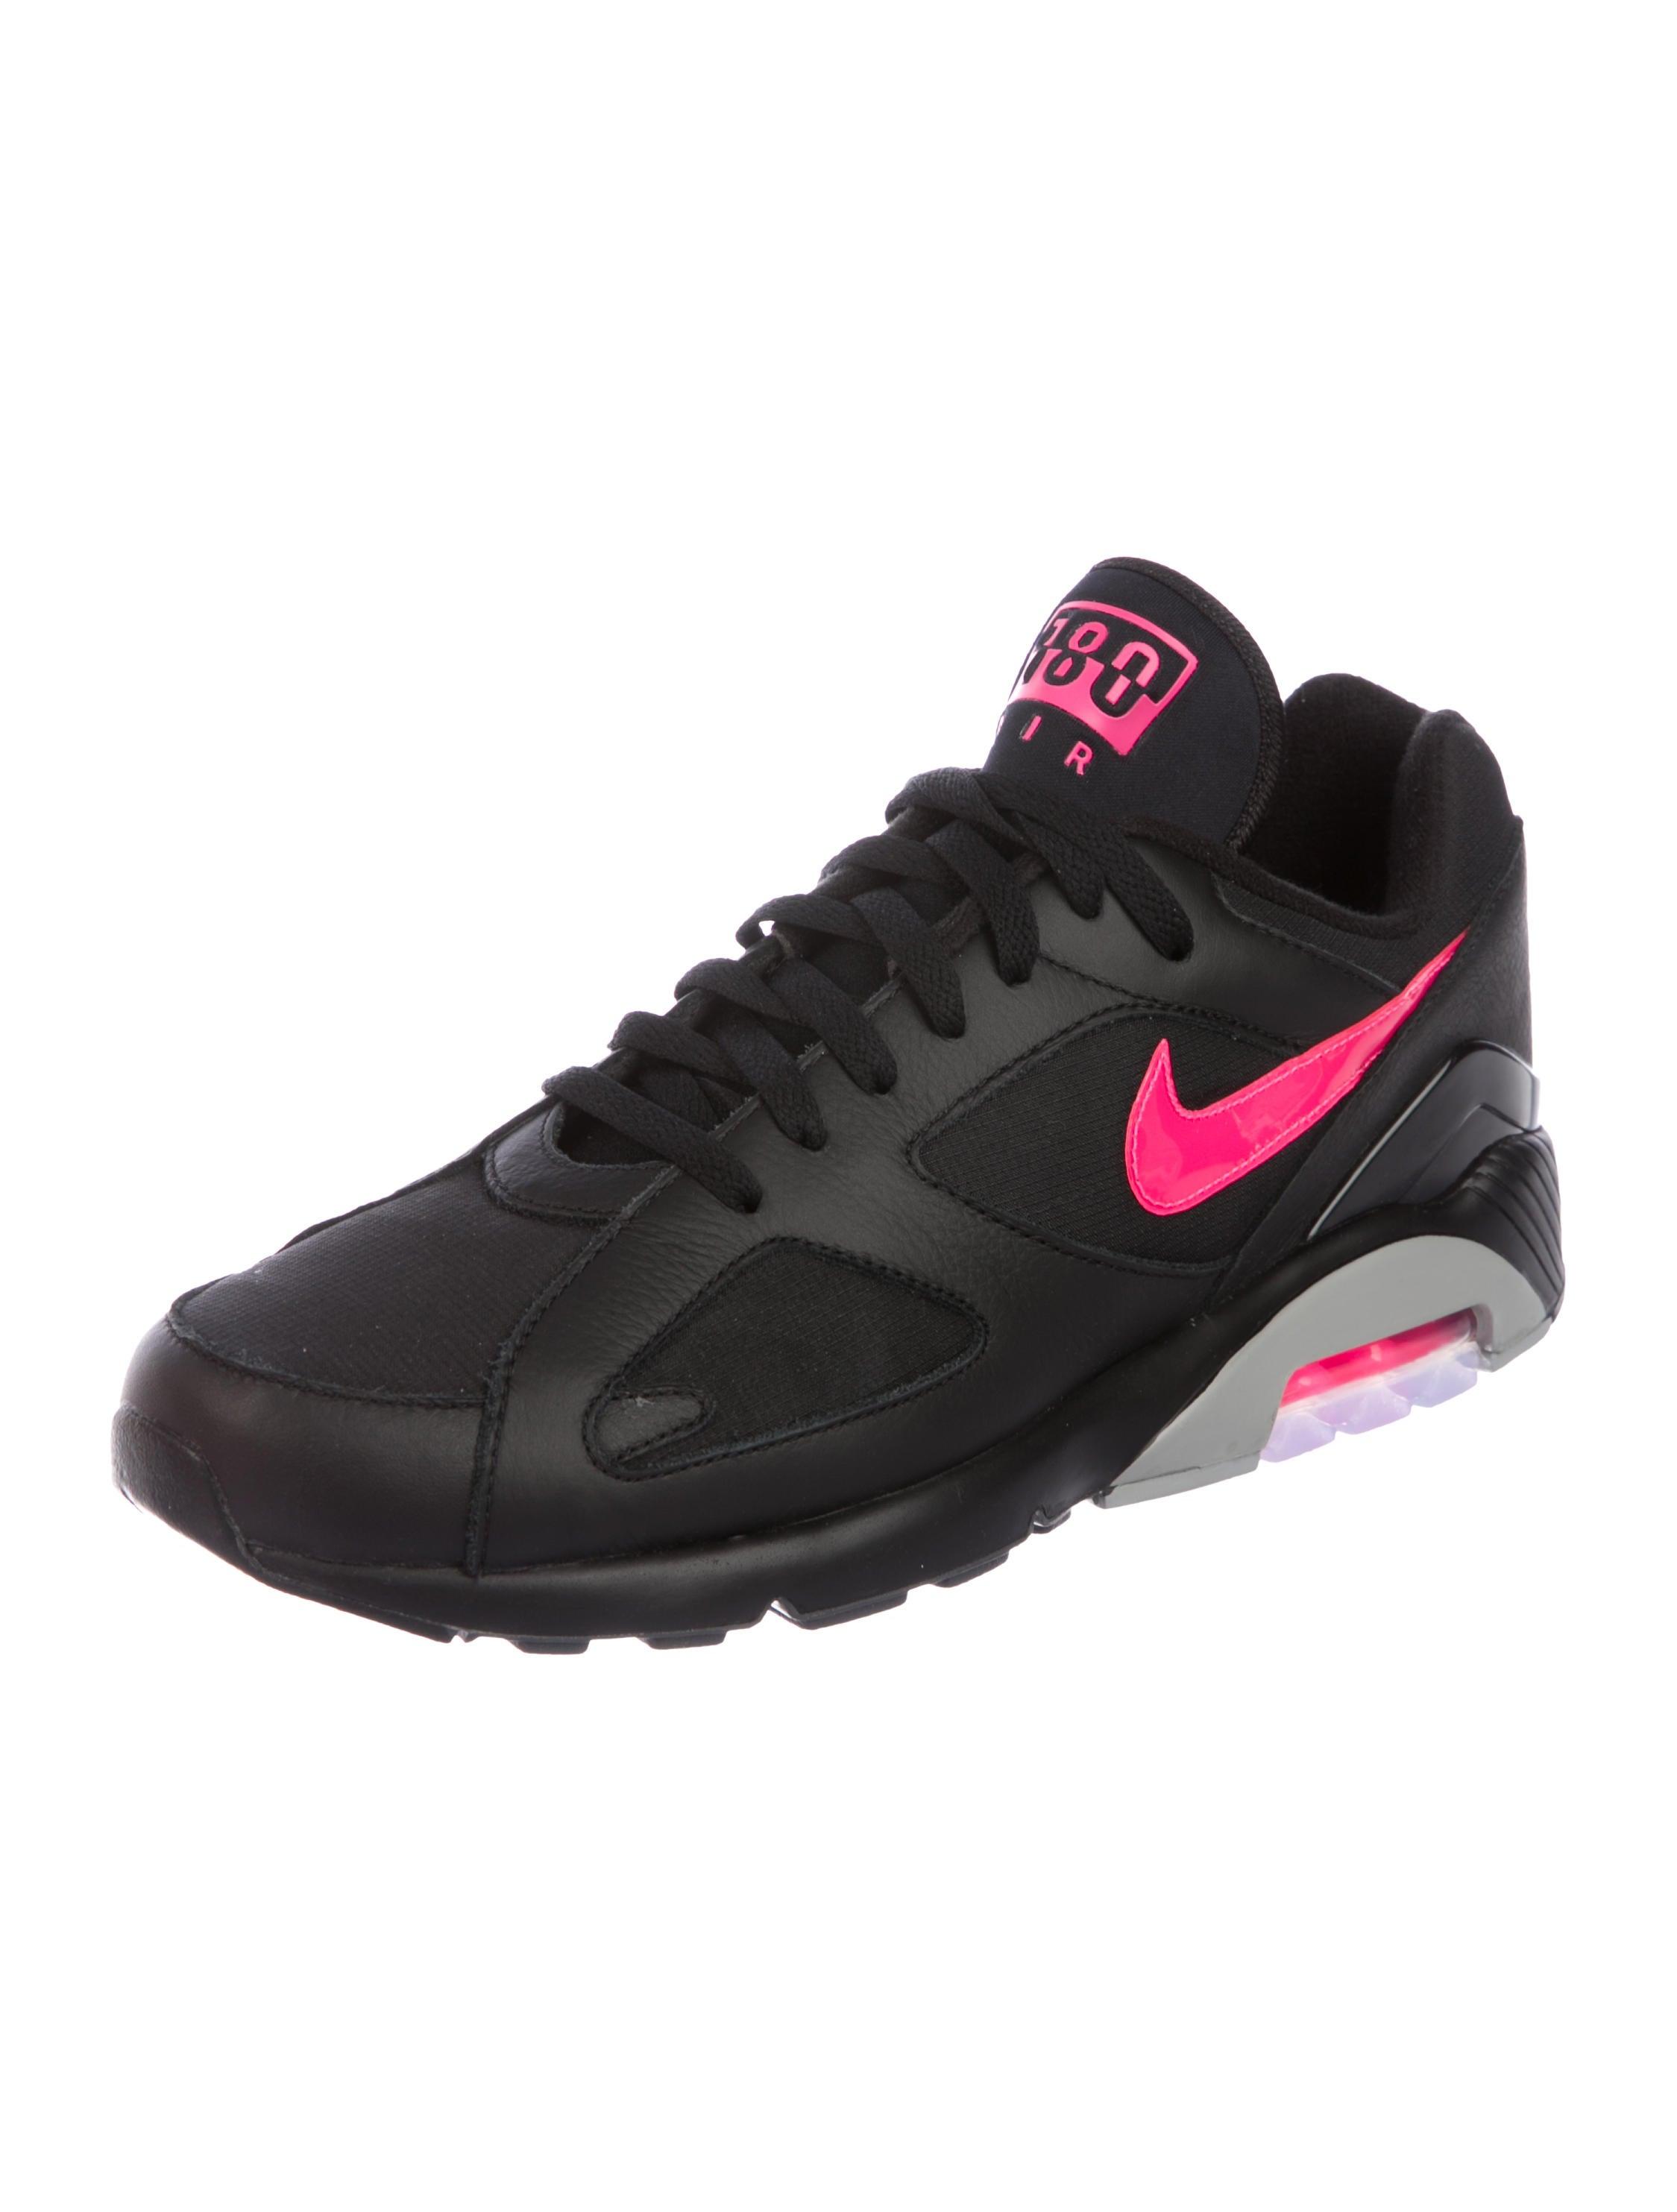 Nike Air Max 190 Sneakers - Black Sneakers, Shoes - WU230742   The ...